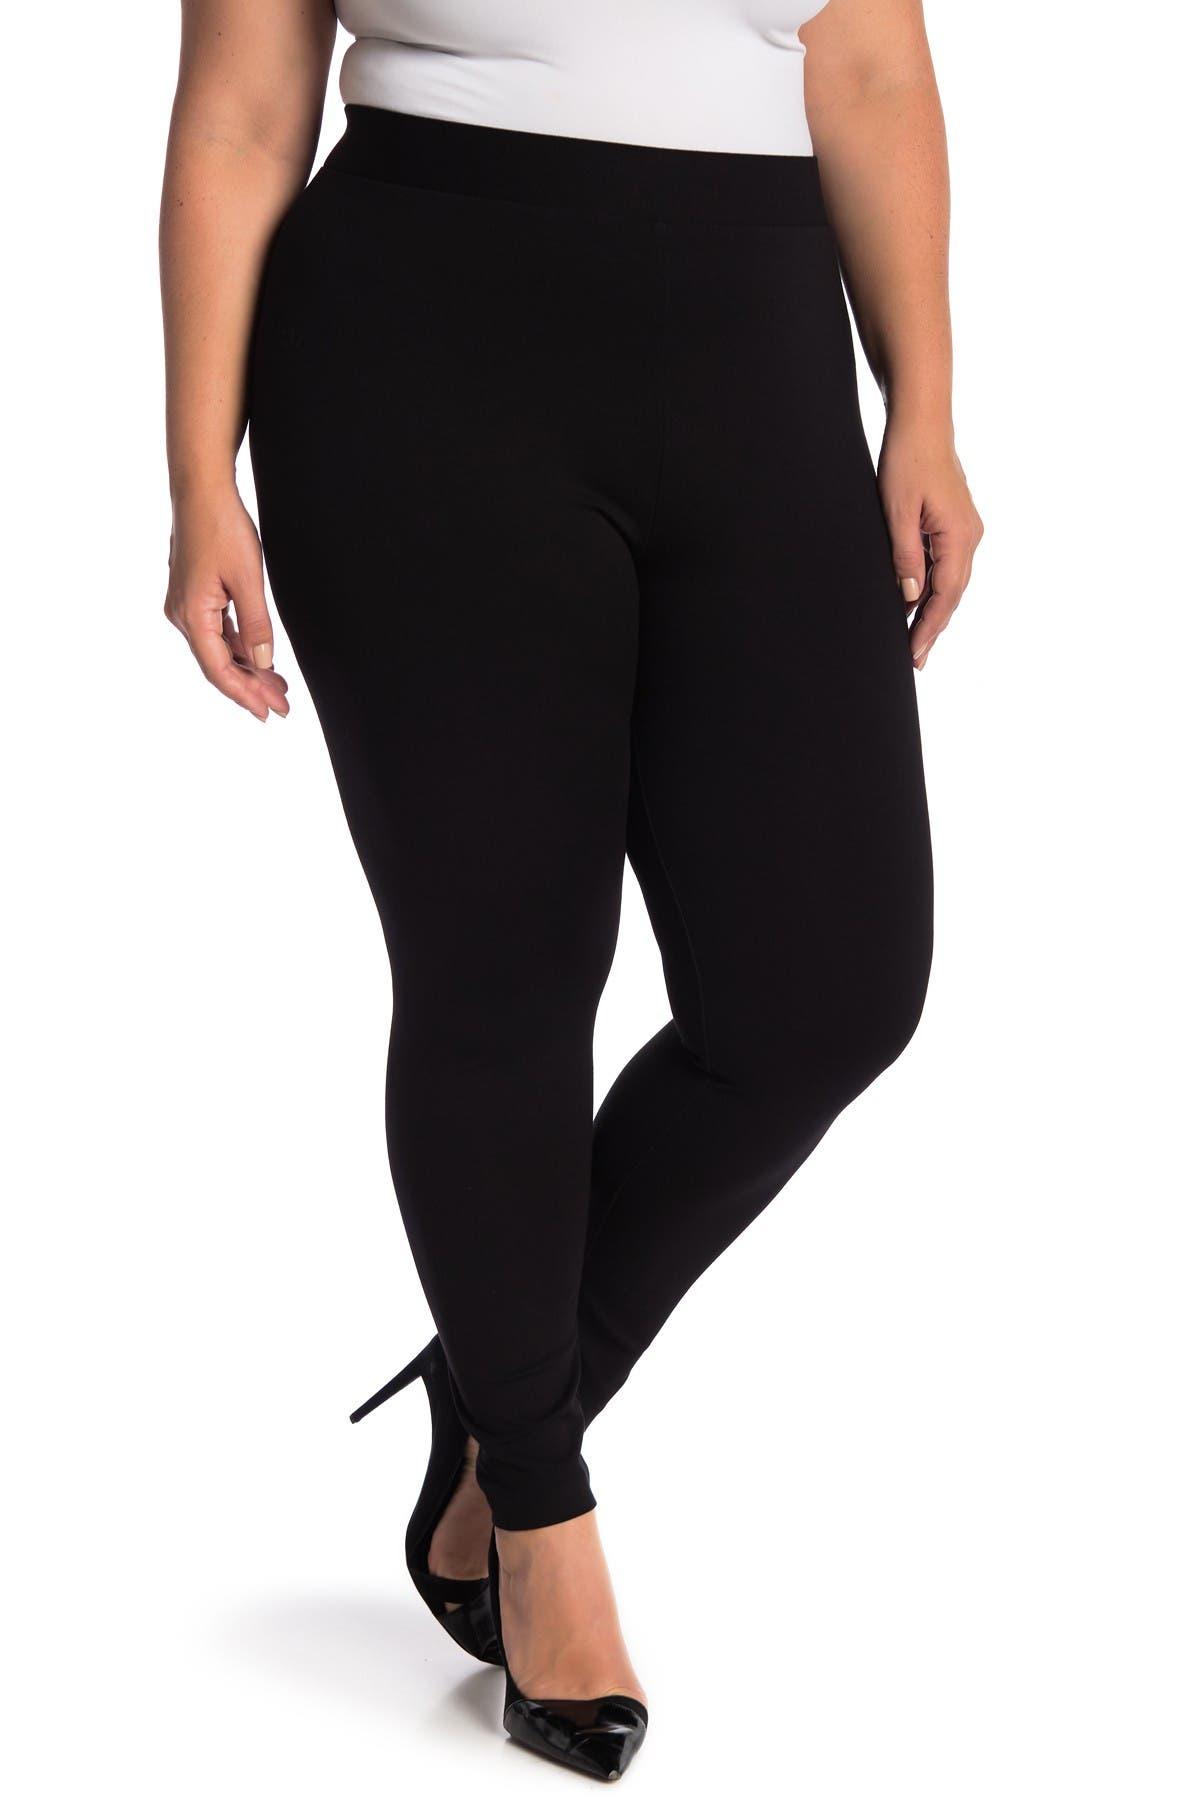 Vince Camuto Womens Plus Size Leggings-Skyla